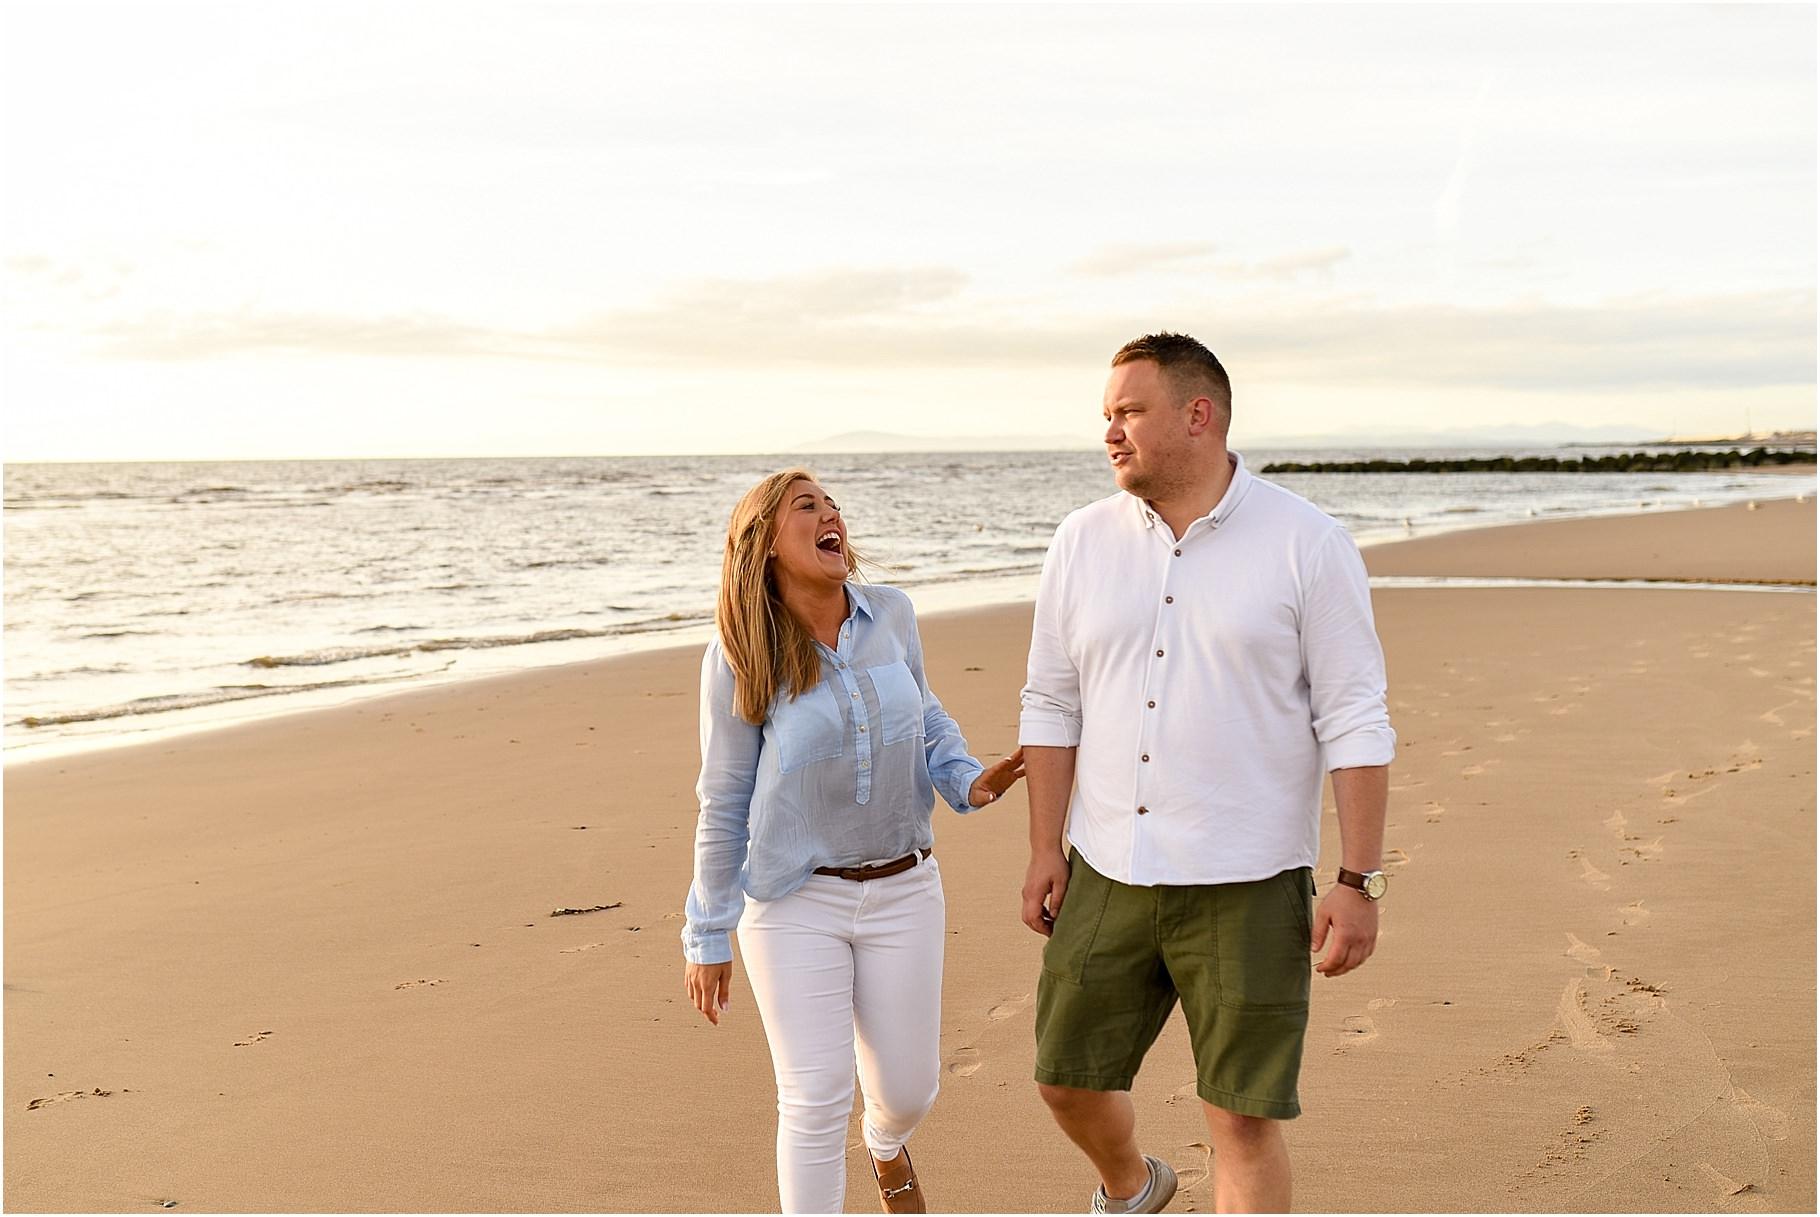 cleveleys-beach-pre-wedding-shoot-10.jpg